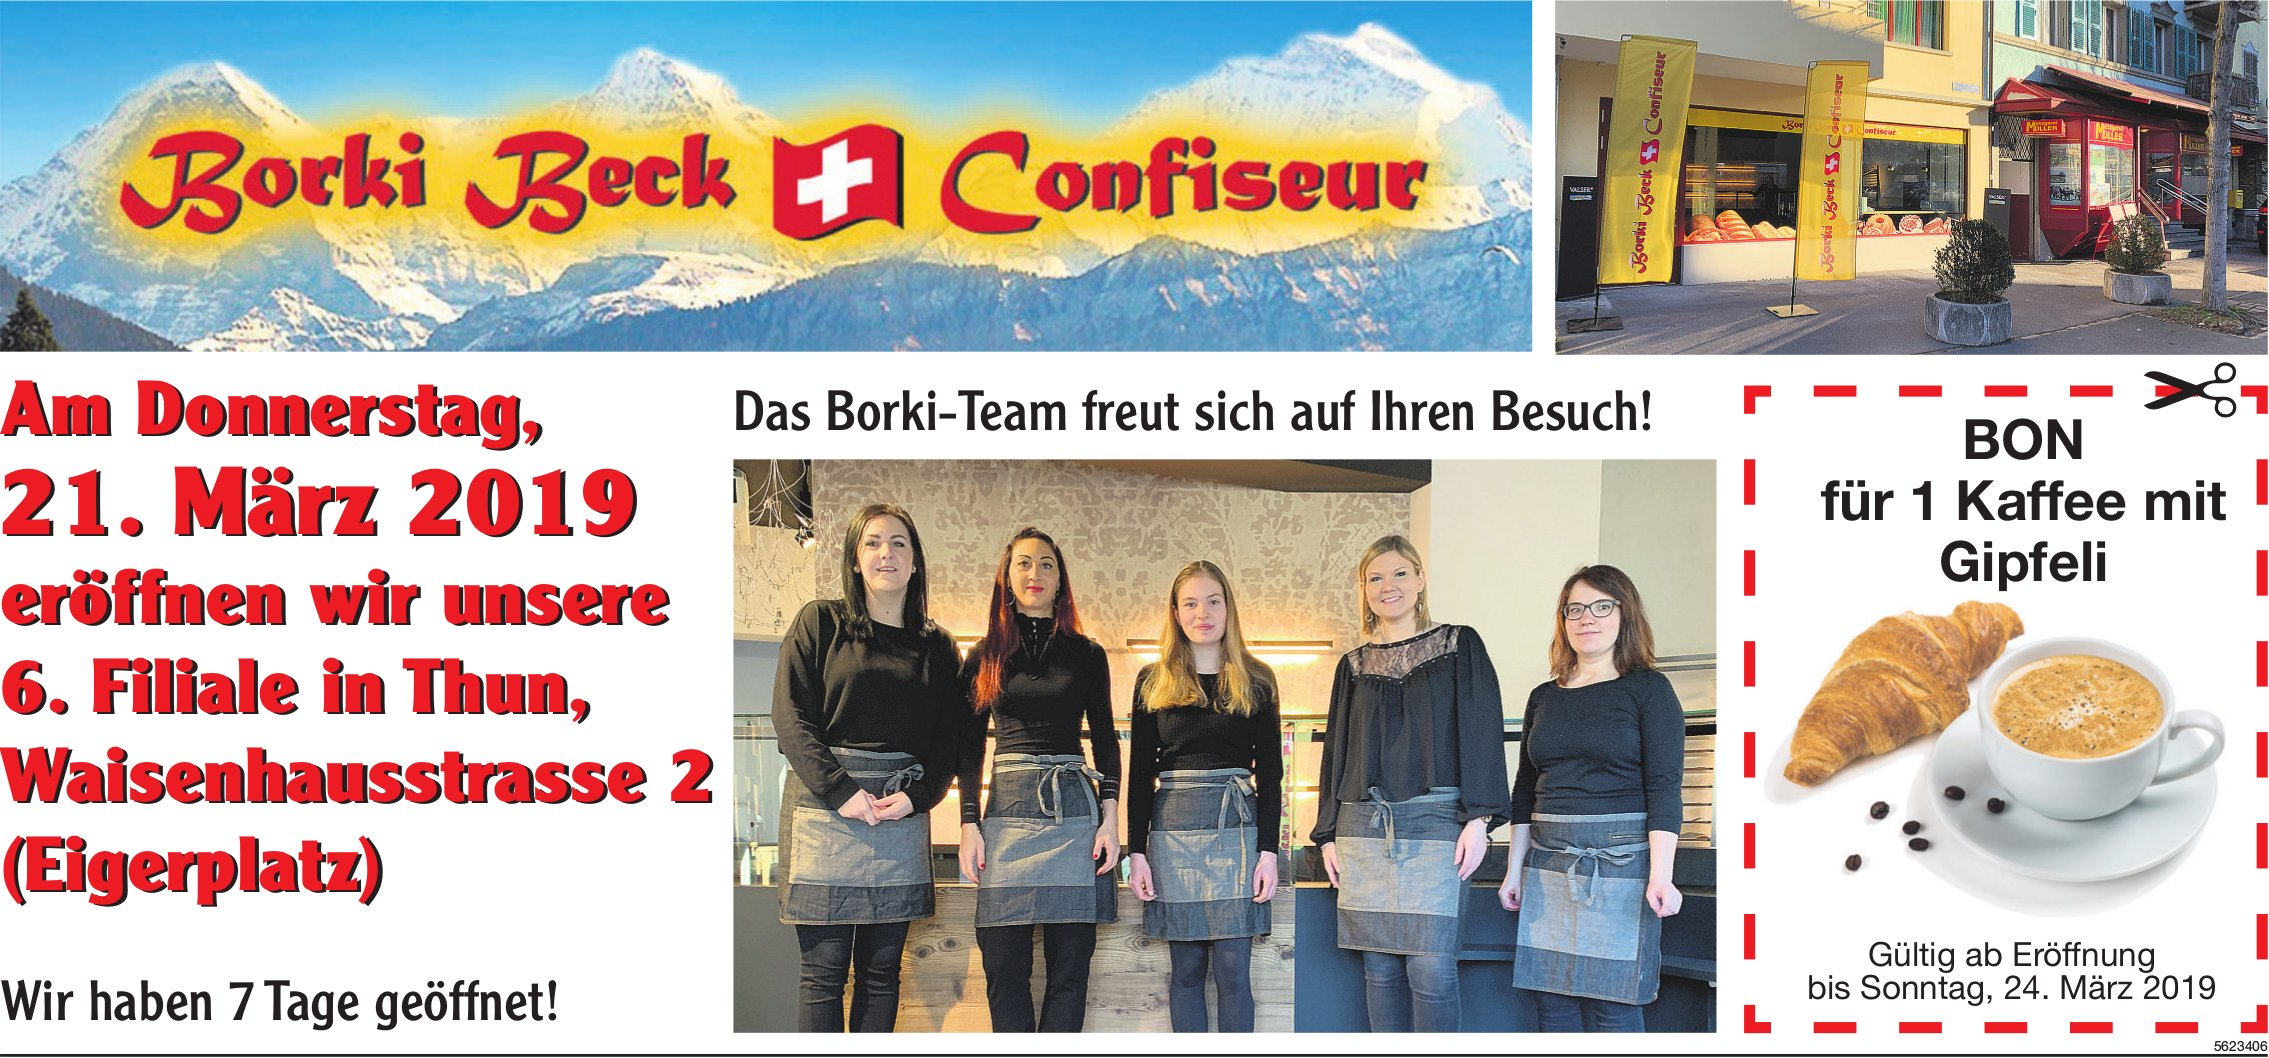 Borki Beck Confiseur - Eröffnung 6. Filiale, 21. März, in Thun